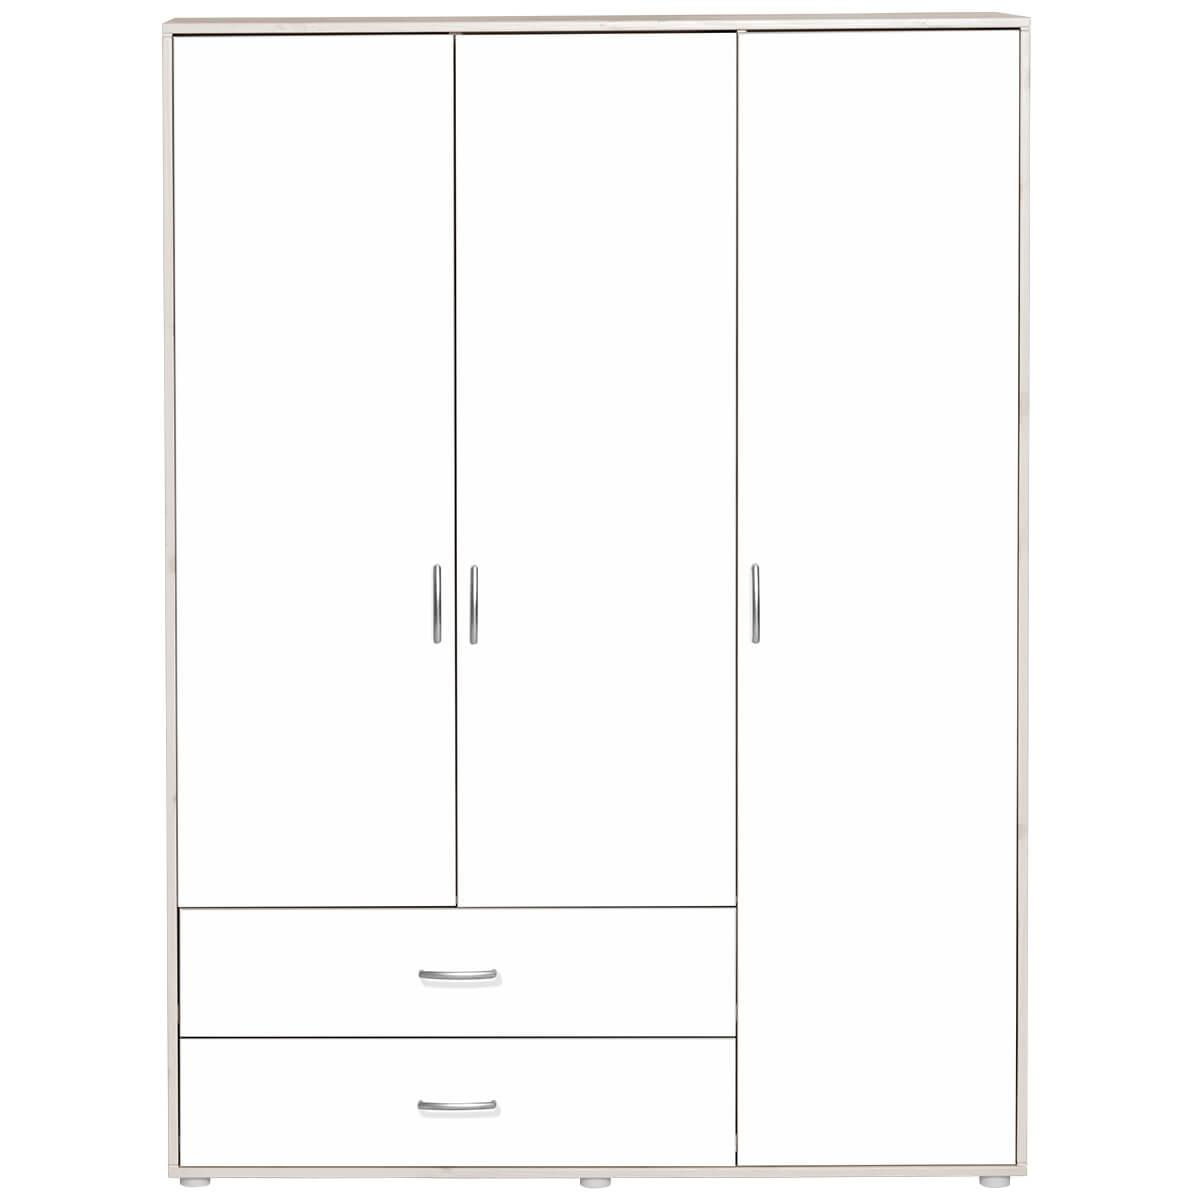 Armario infantil extra alto 3 puertas 2 cajones 4 estantes 2 barras NEW CLASSIC Flexa blanco cal - blanco - blanco